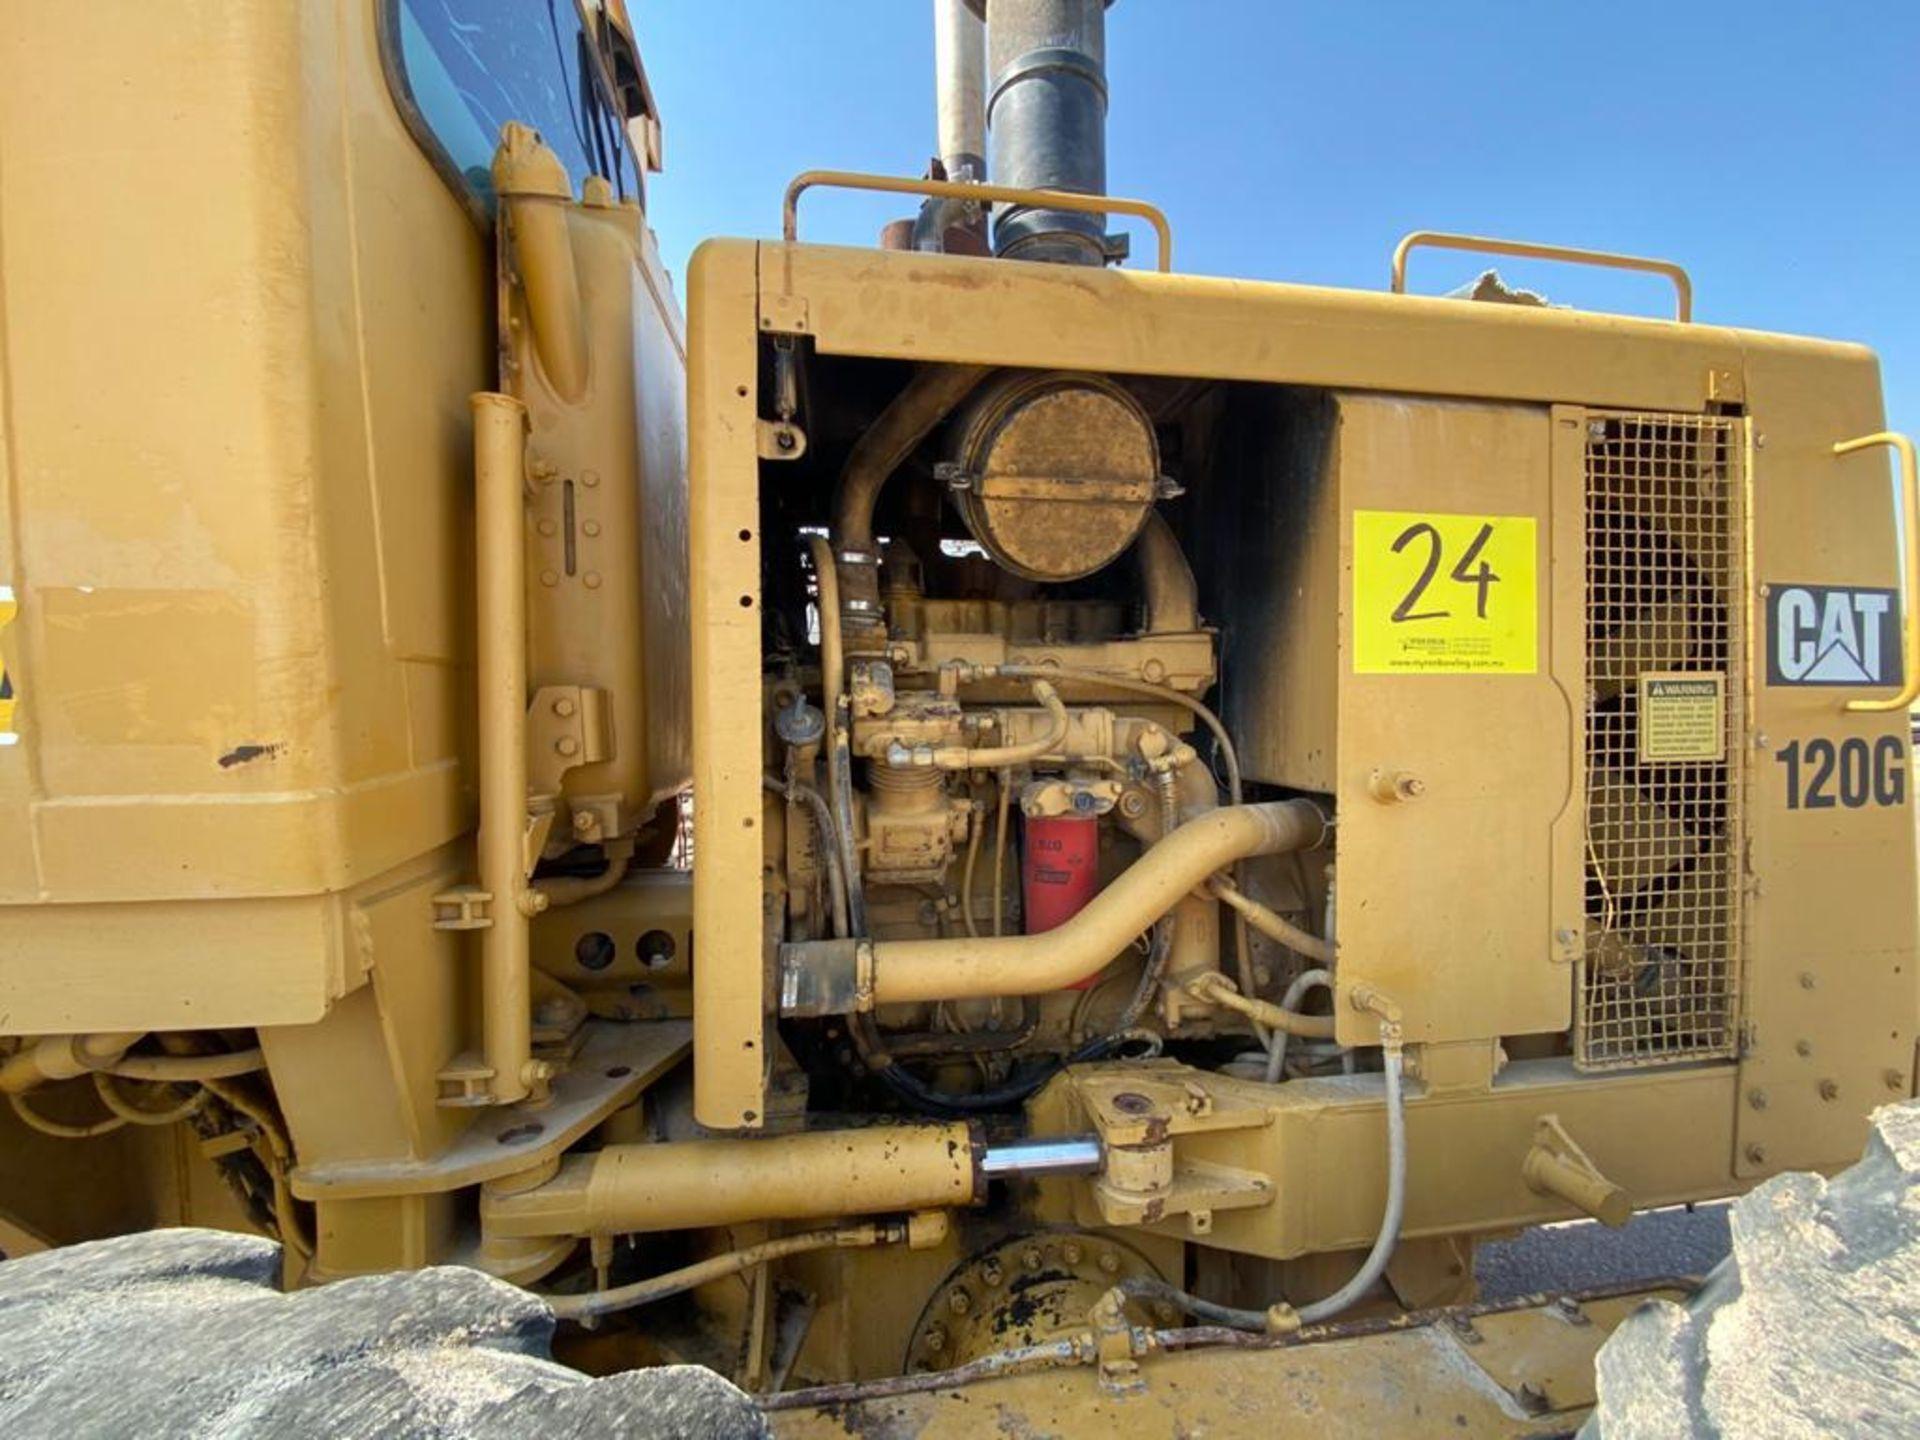 Caterpillar 120G Motor Grader, Serial number 87V09646, Motor number PQ883-2/07Z28983 - Image 50 of 61